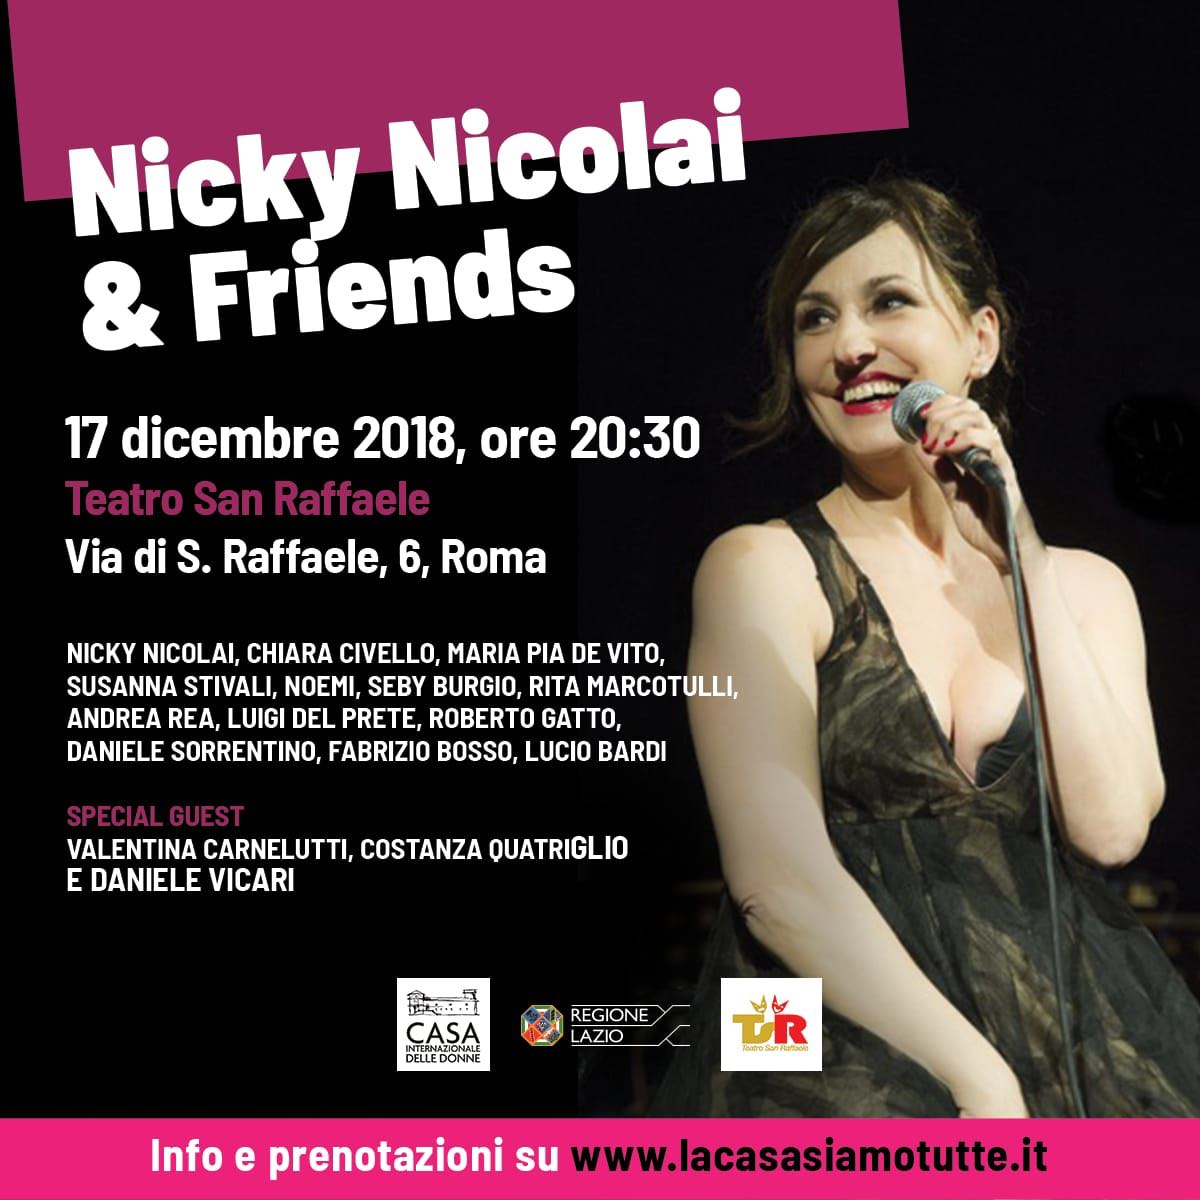 Nicky Nicolai & Friends